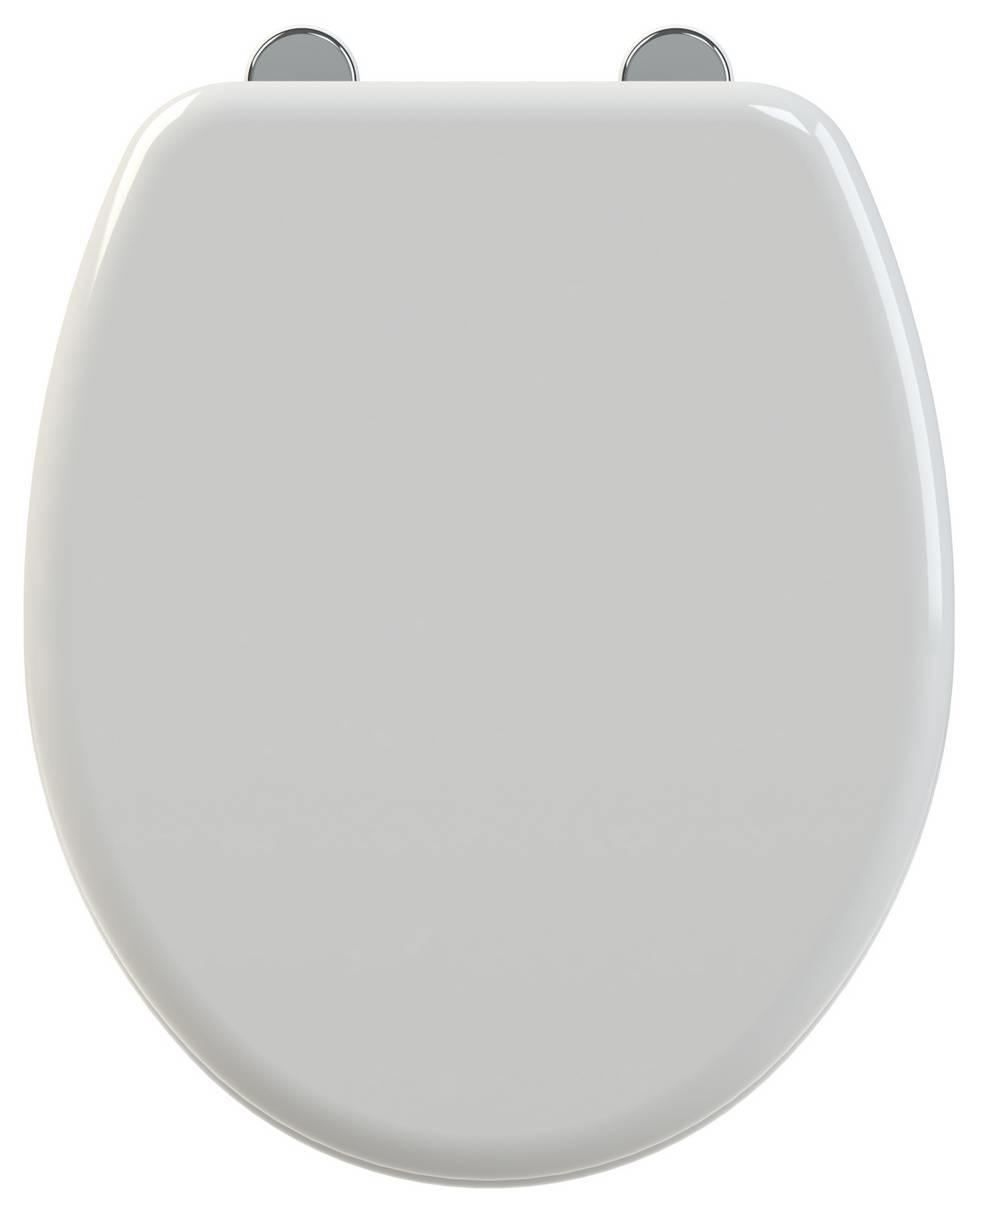 SIMERO - WC-zitting - Glanzend Wit